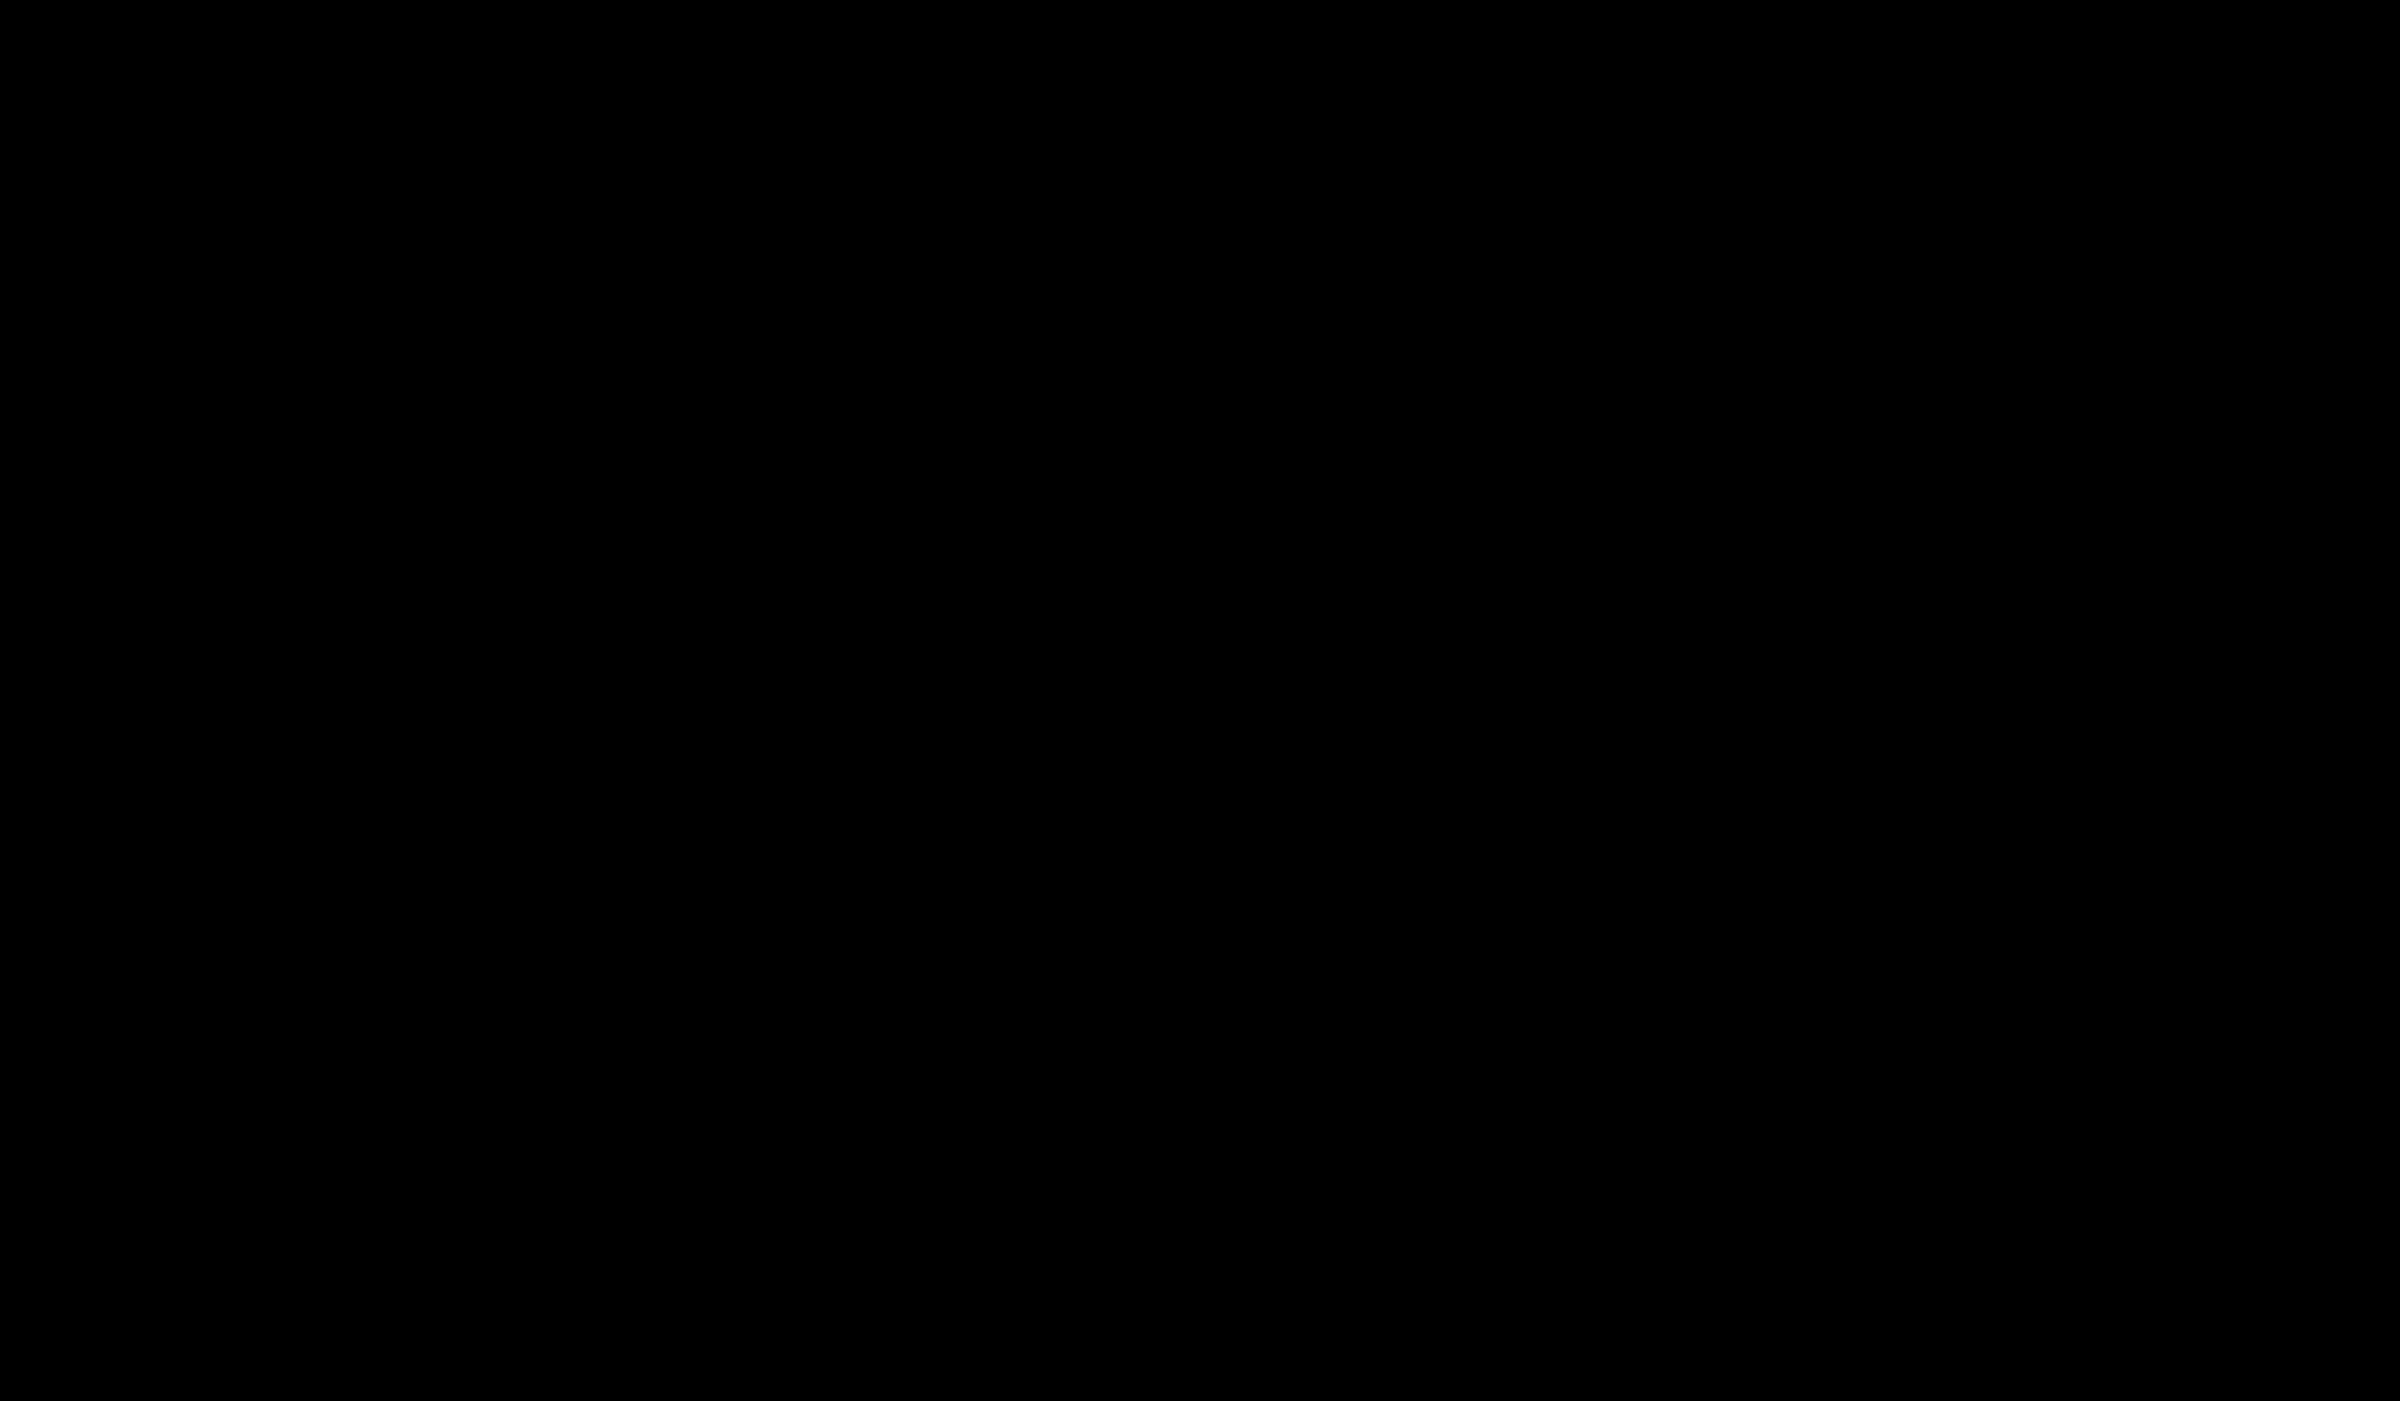 2400x1401 Clipart